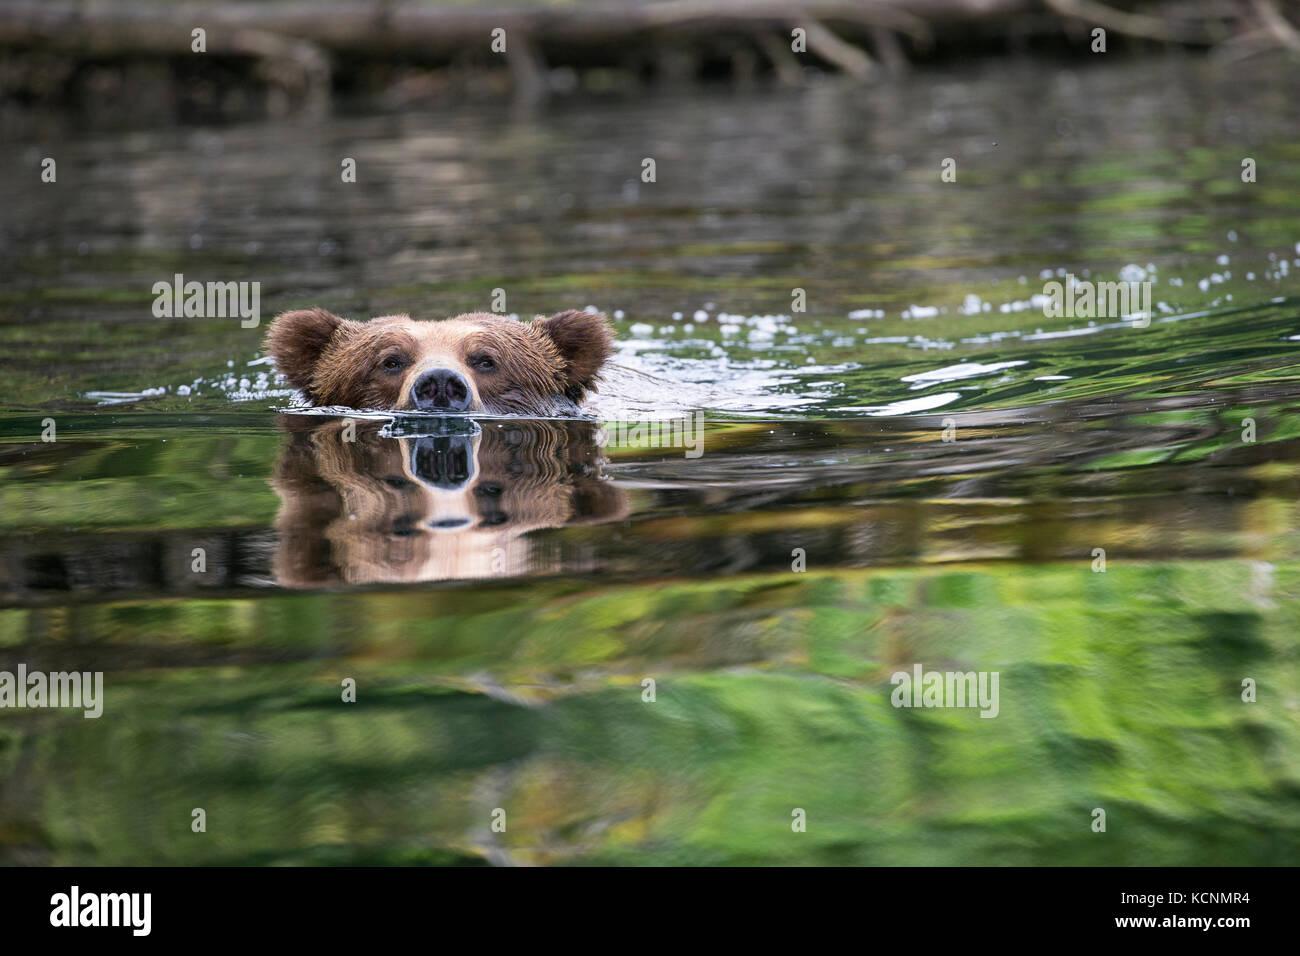 Grizzly bear (Ursus arctos horribilis), large male, swimming, Khutzeymateen Grizzly Bear Sanctuary, British Columbia, - Stock Image